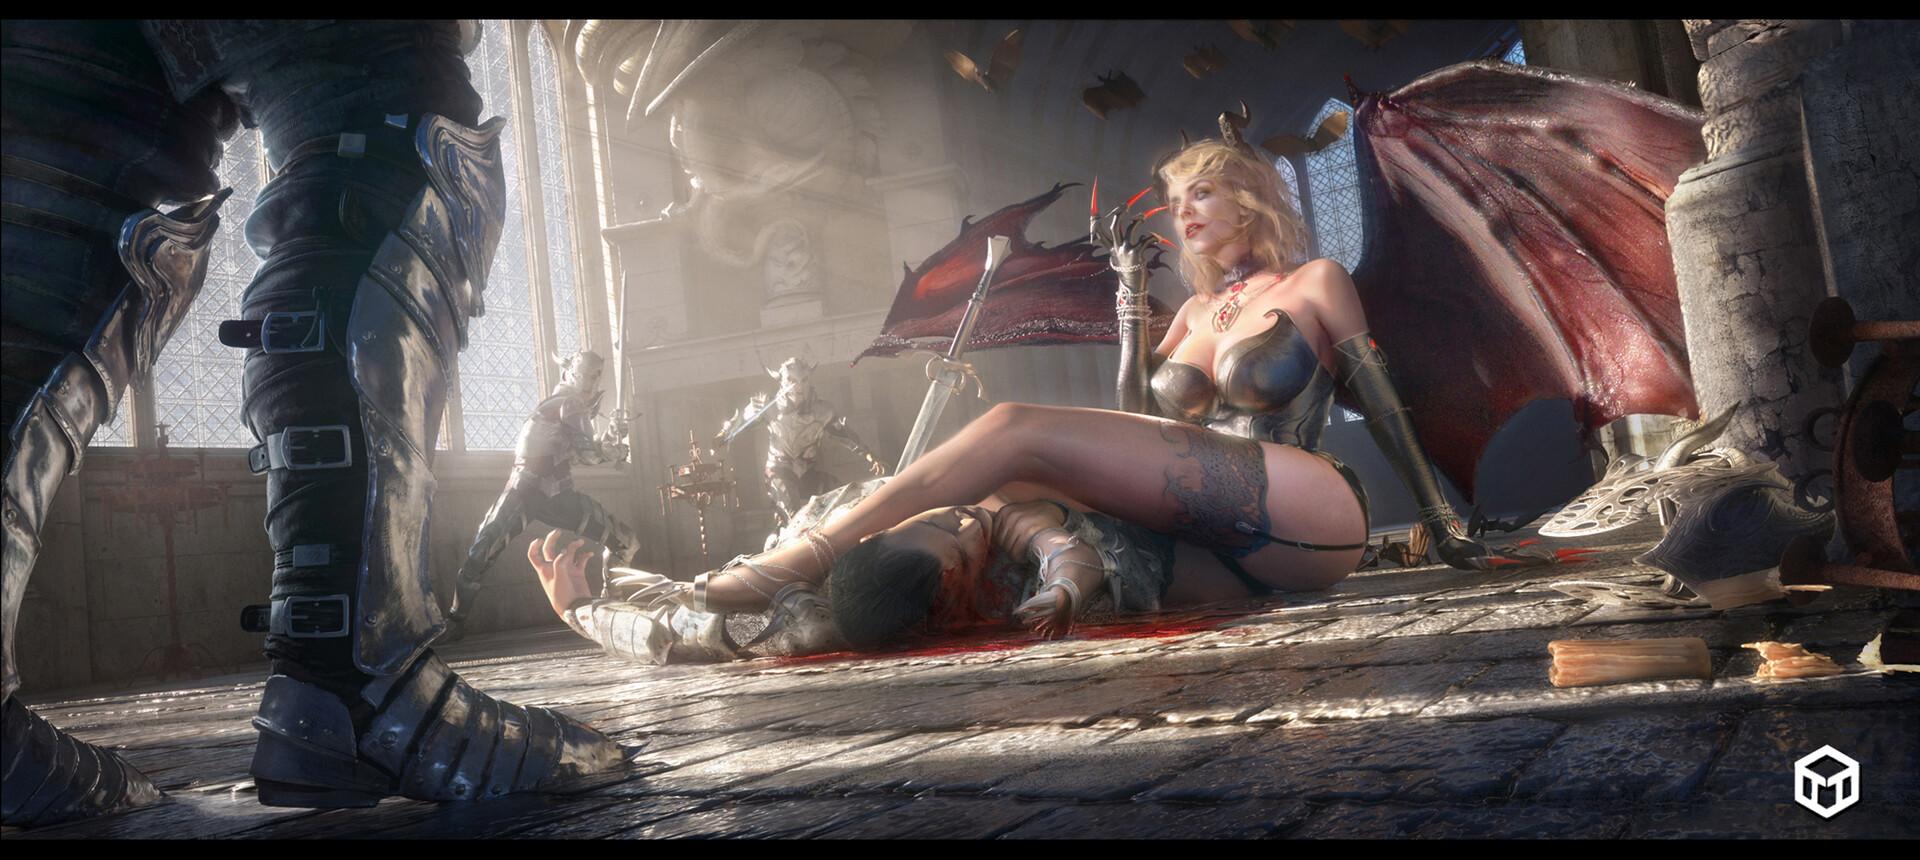 General 1920x860 artwork fantasy art legs blood women claws fantasy girl succubus demon girls horns corpse